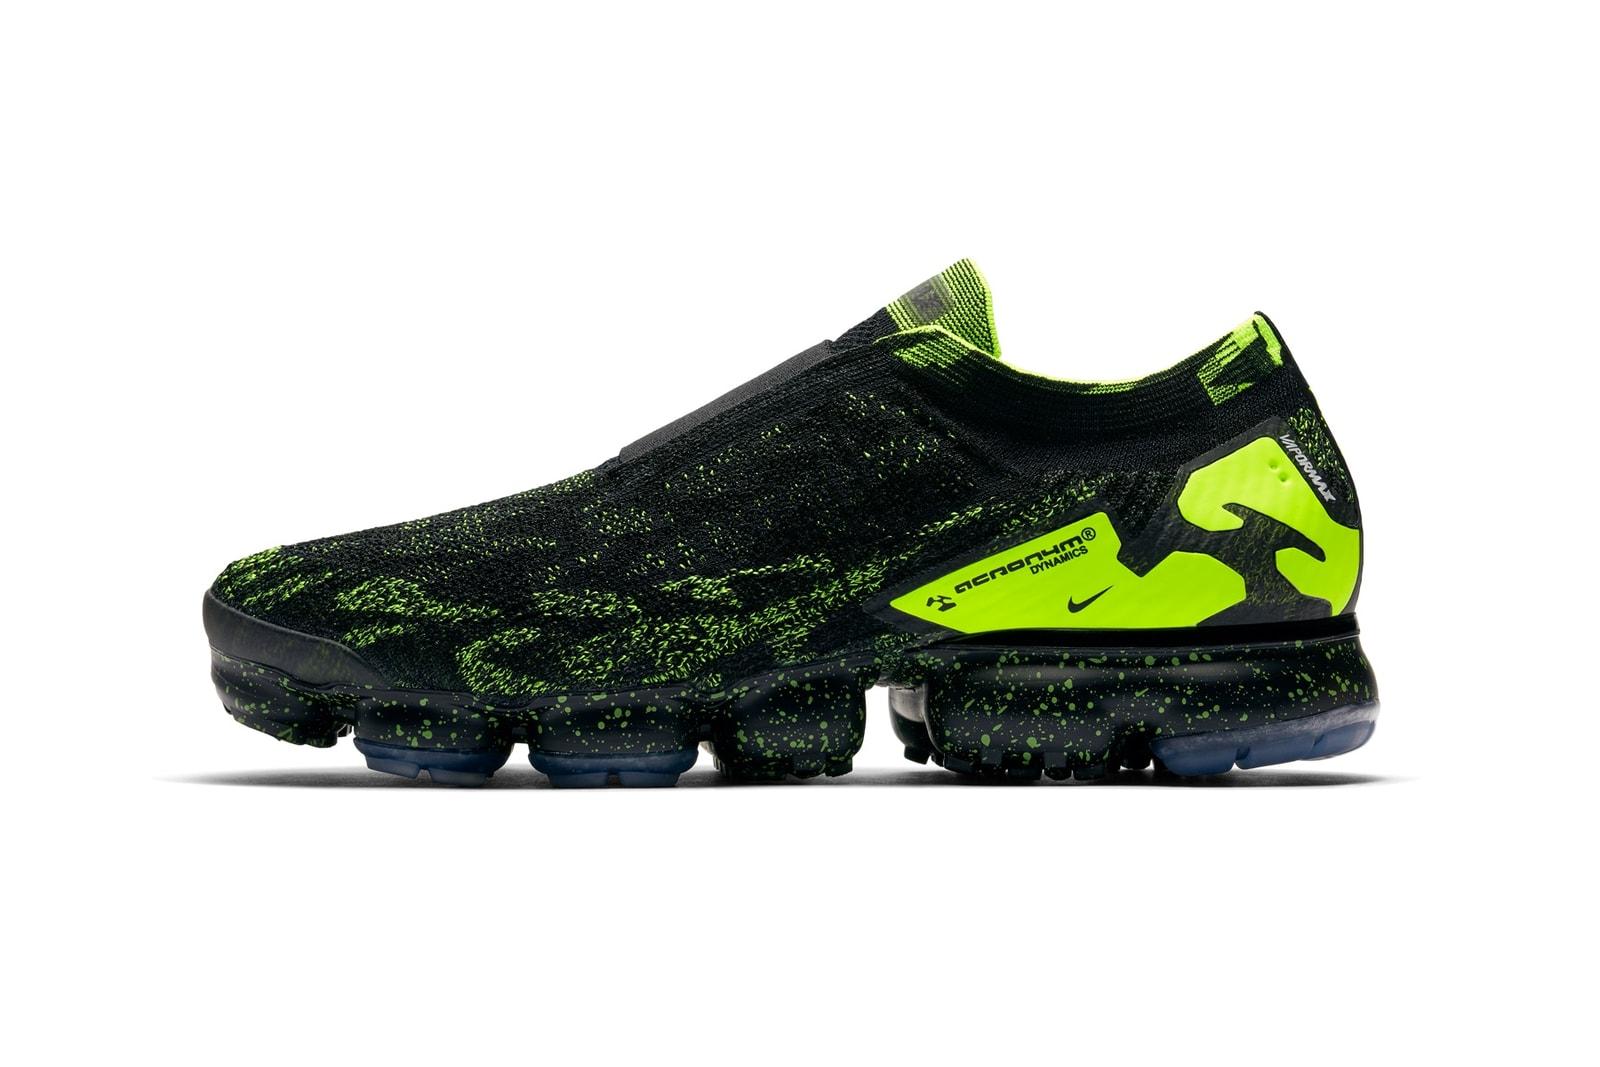 ACRONYM x Nike Air VaporMax Moc 2 聯名系列正式發布